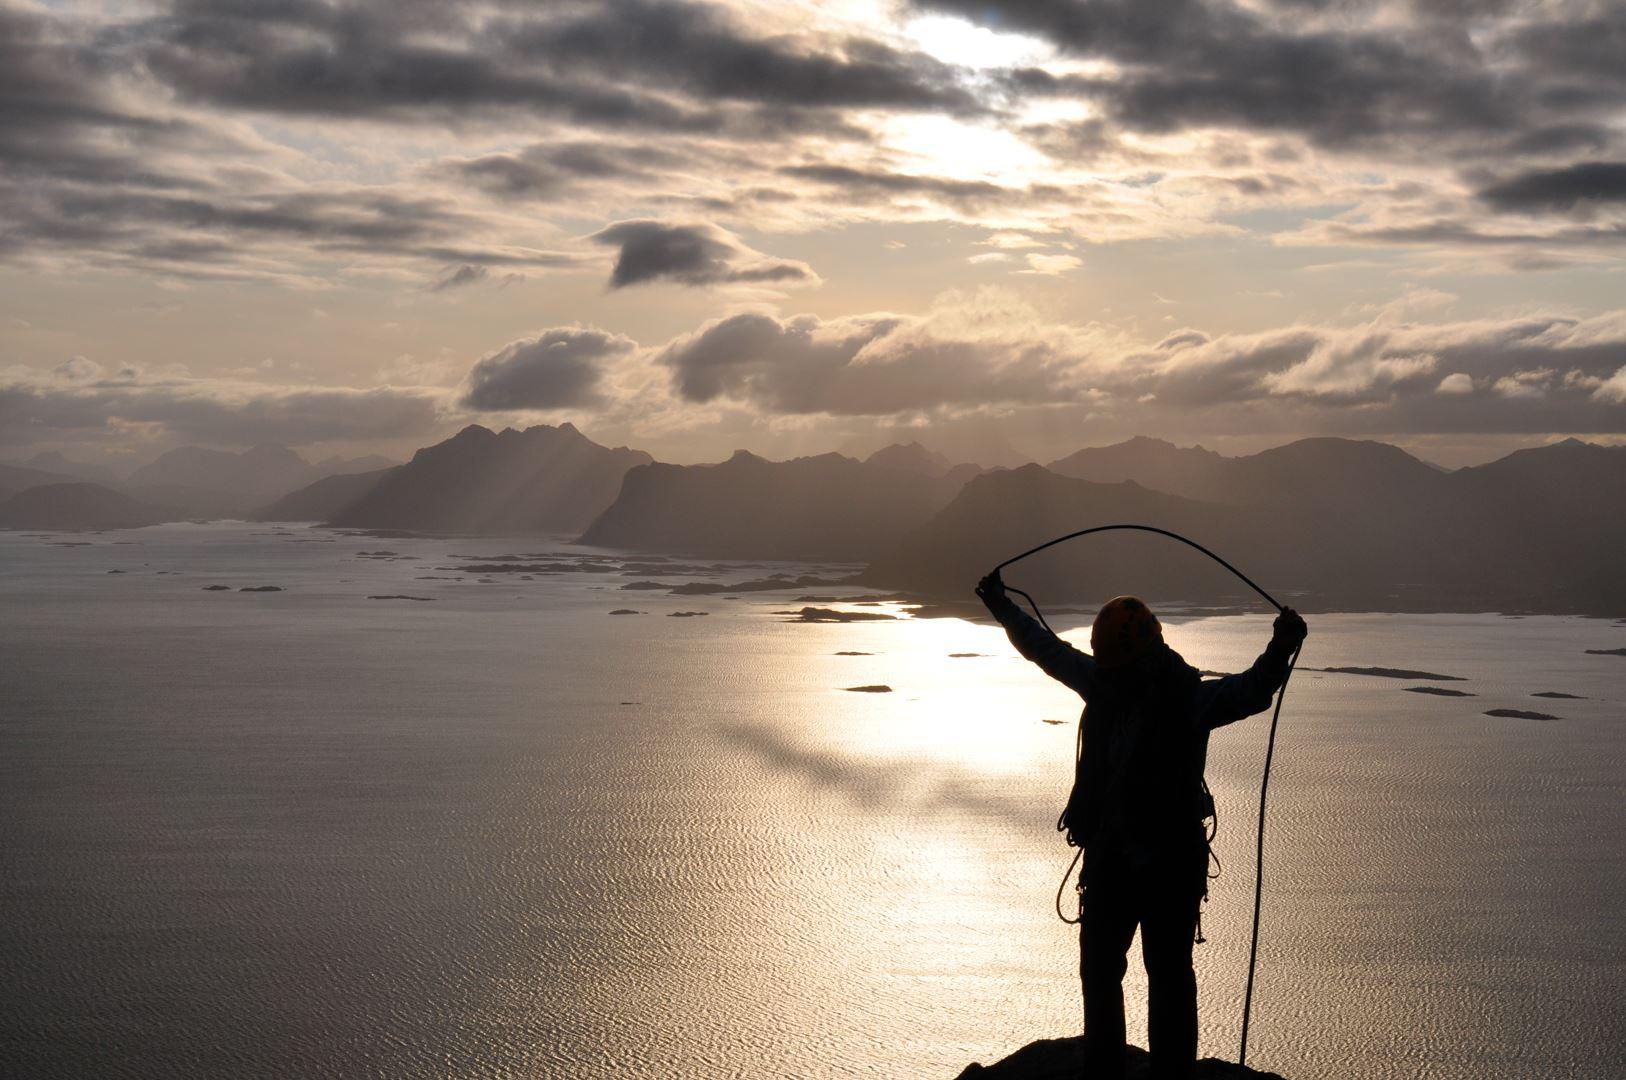 © Northern Alpine Guides, Lofoten Ryggtraverser - Northern Alpine guides